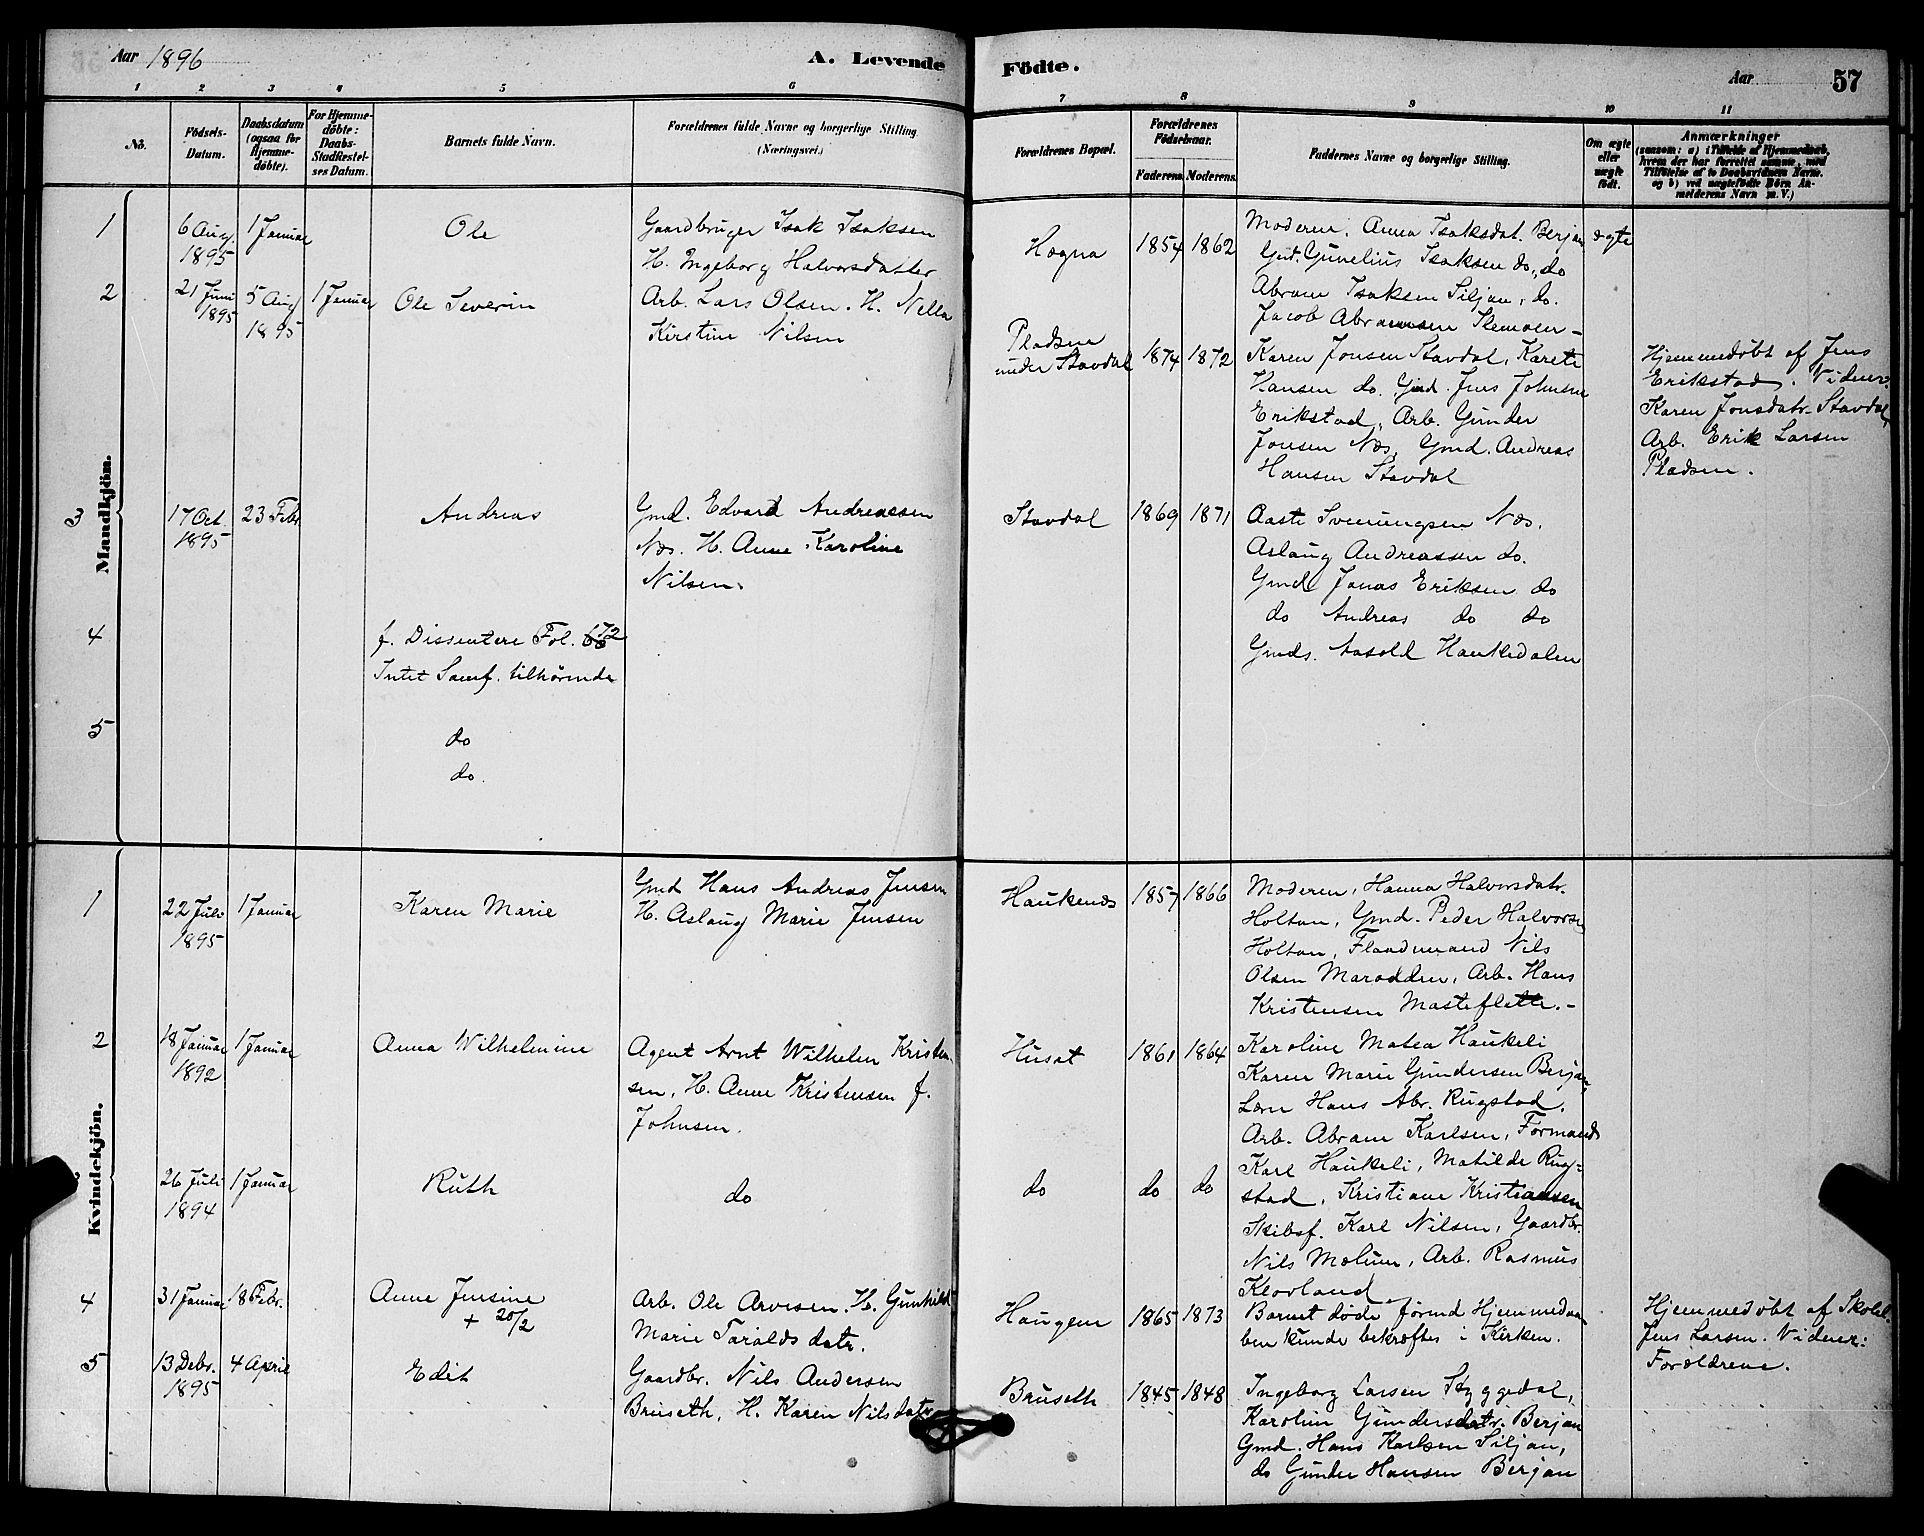 SAKO, Solum kirkebøker, G/Gb/L0003: Klokkerbok nr. II 3, 1880-1898, s. 57